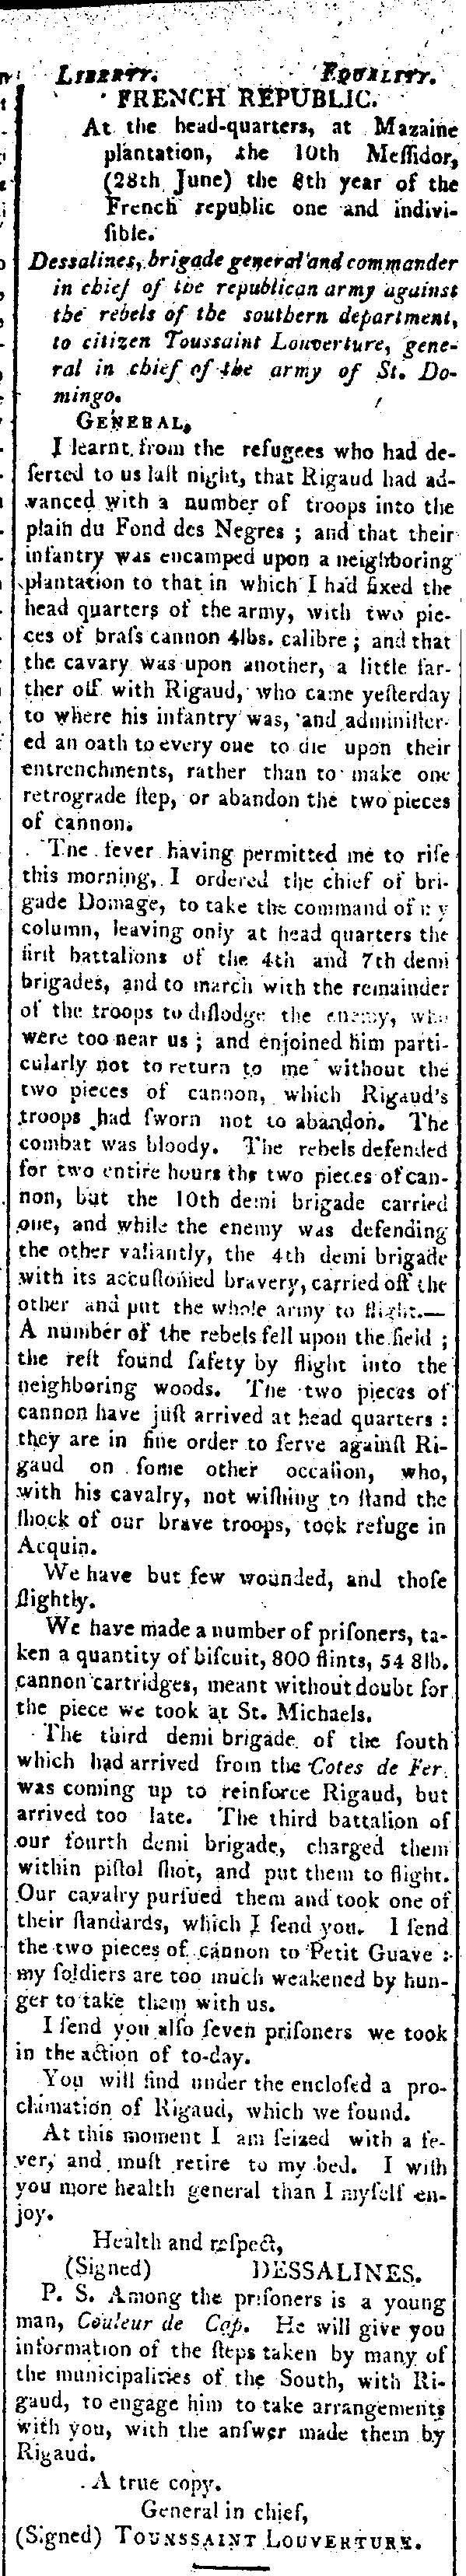 Dessalines, Telegraphe and Daily Advertiser, Baltimore.jpg